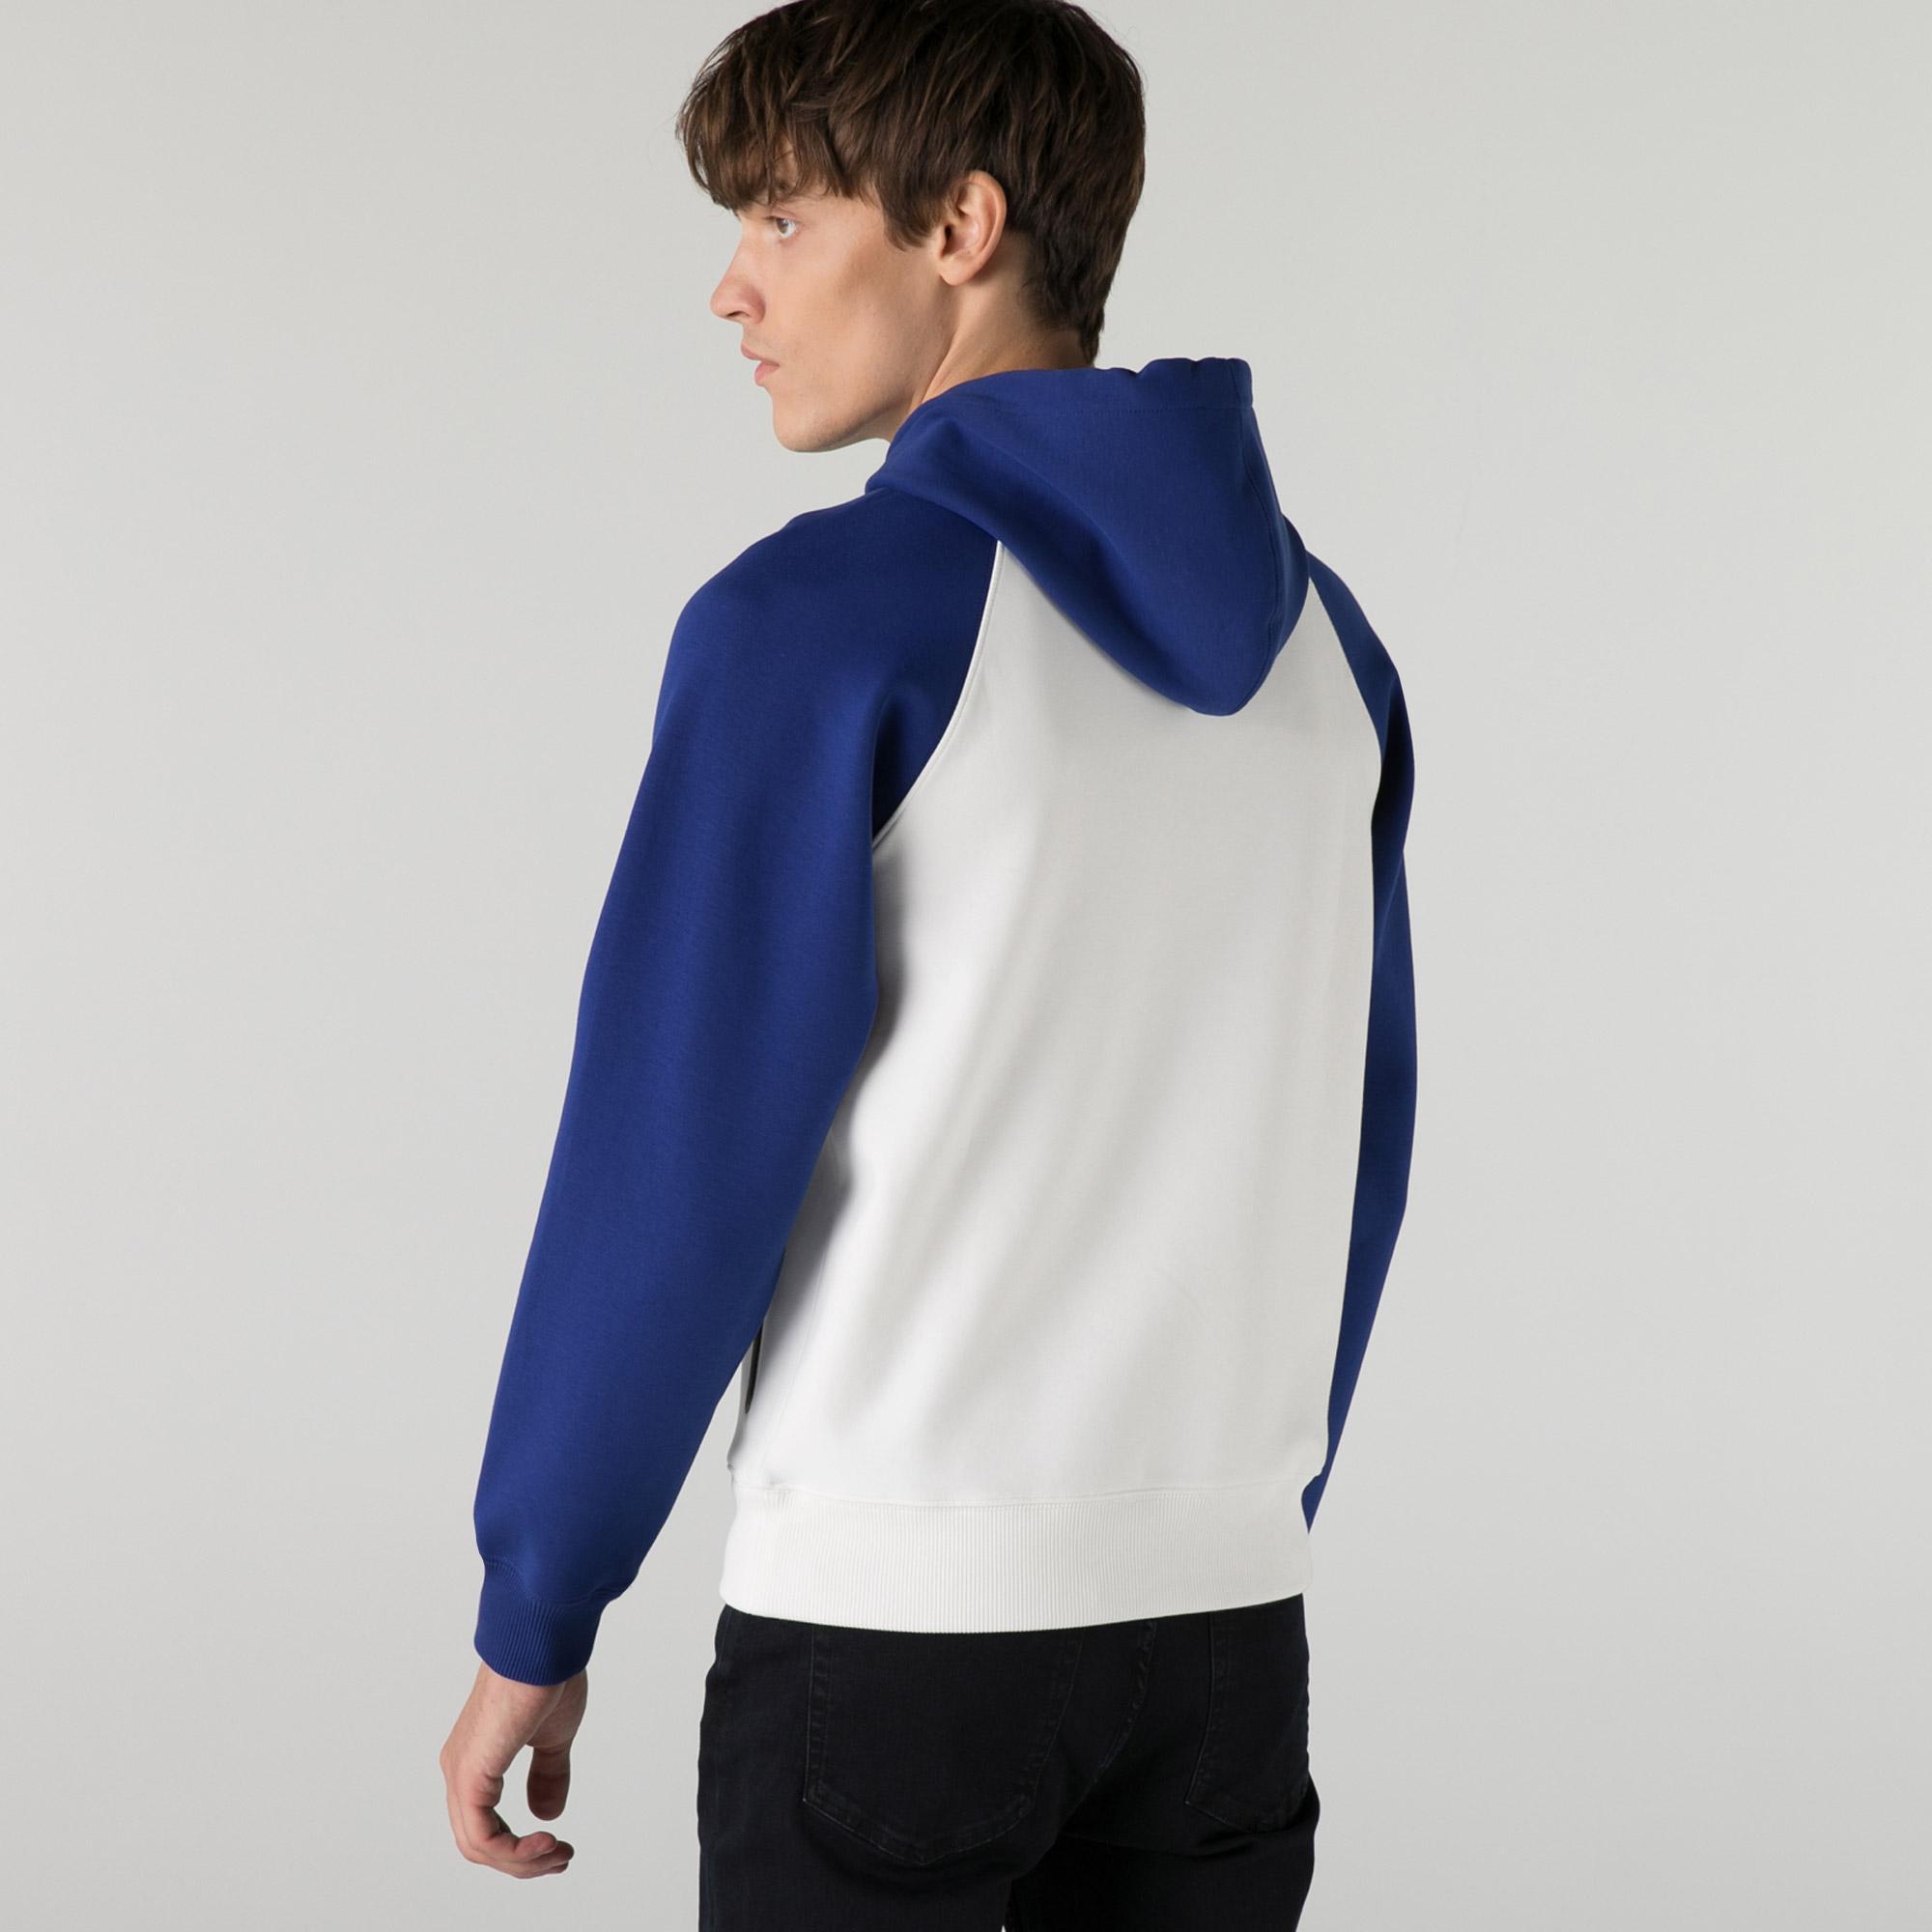 Lacoste Erkek Relaxed Fit Kapüşonlu Renk Bloklu Beyaz Sweatshirt